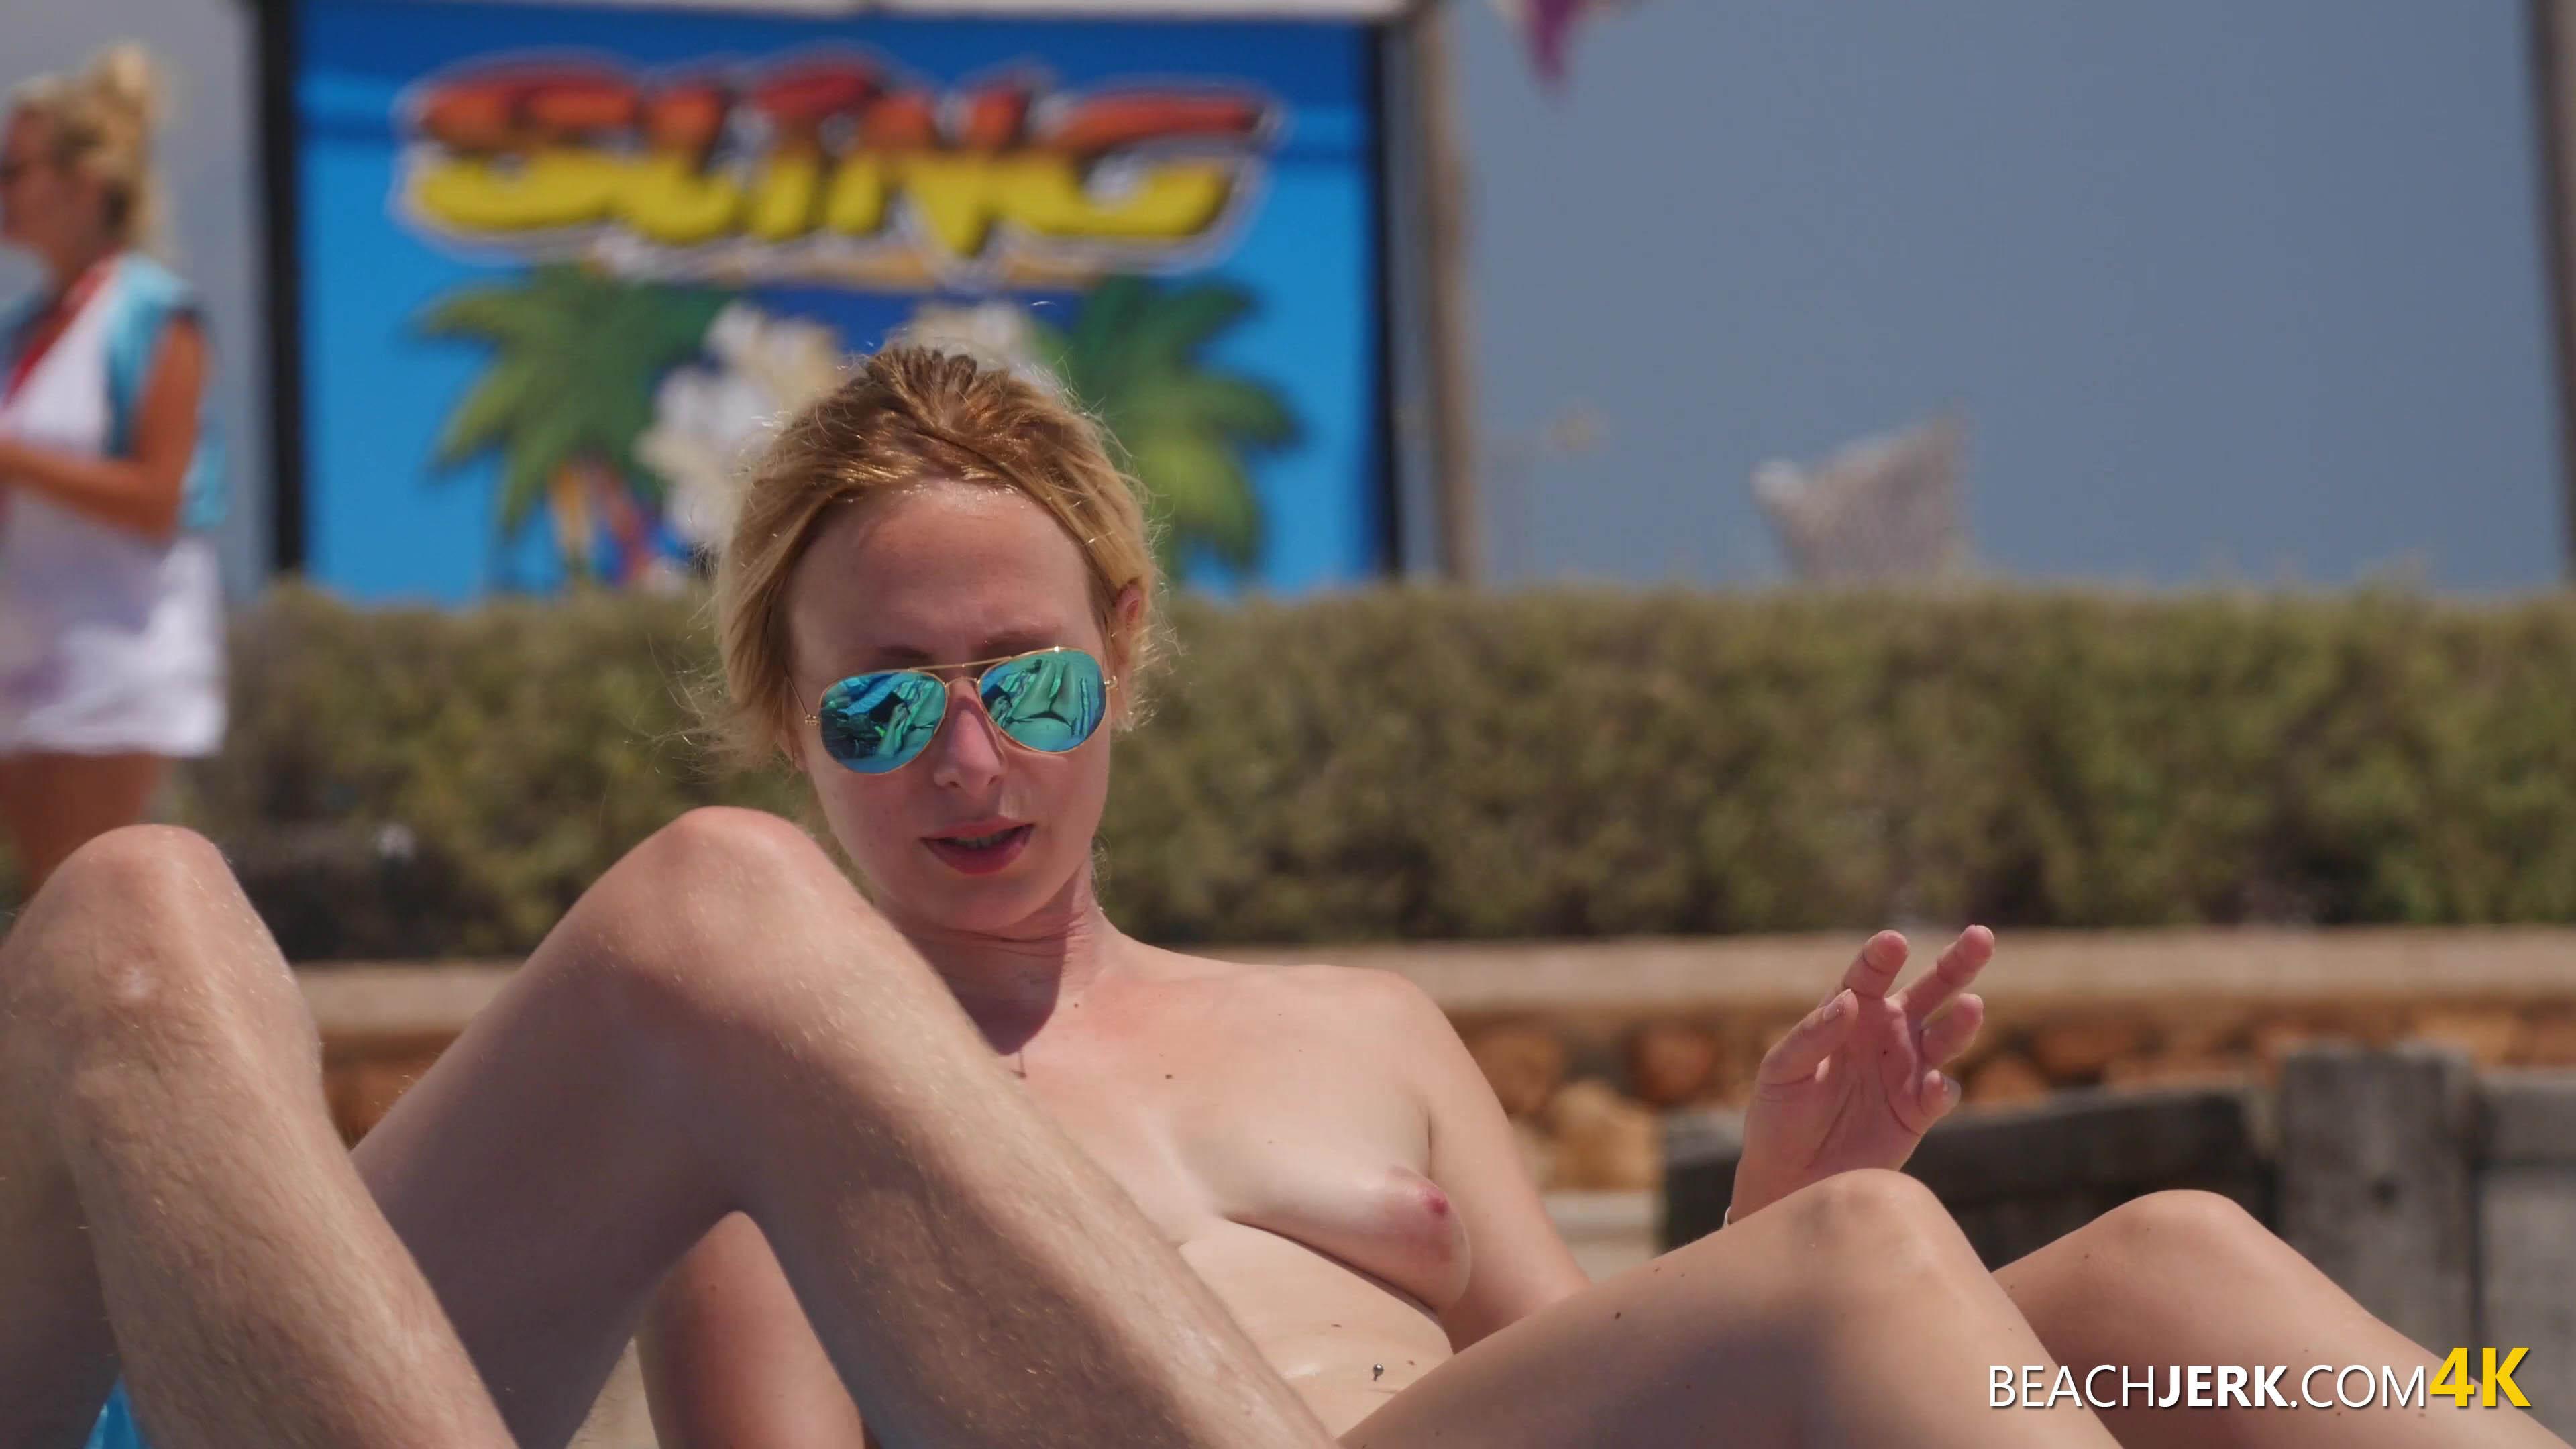 big blonde nips free voyeuristic photos of topless babes